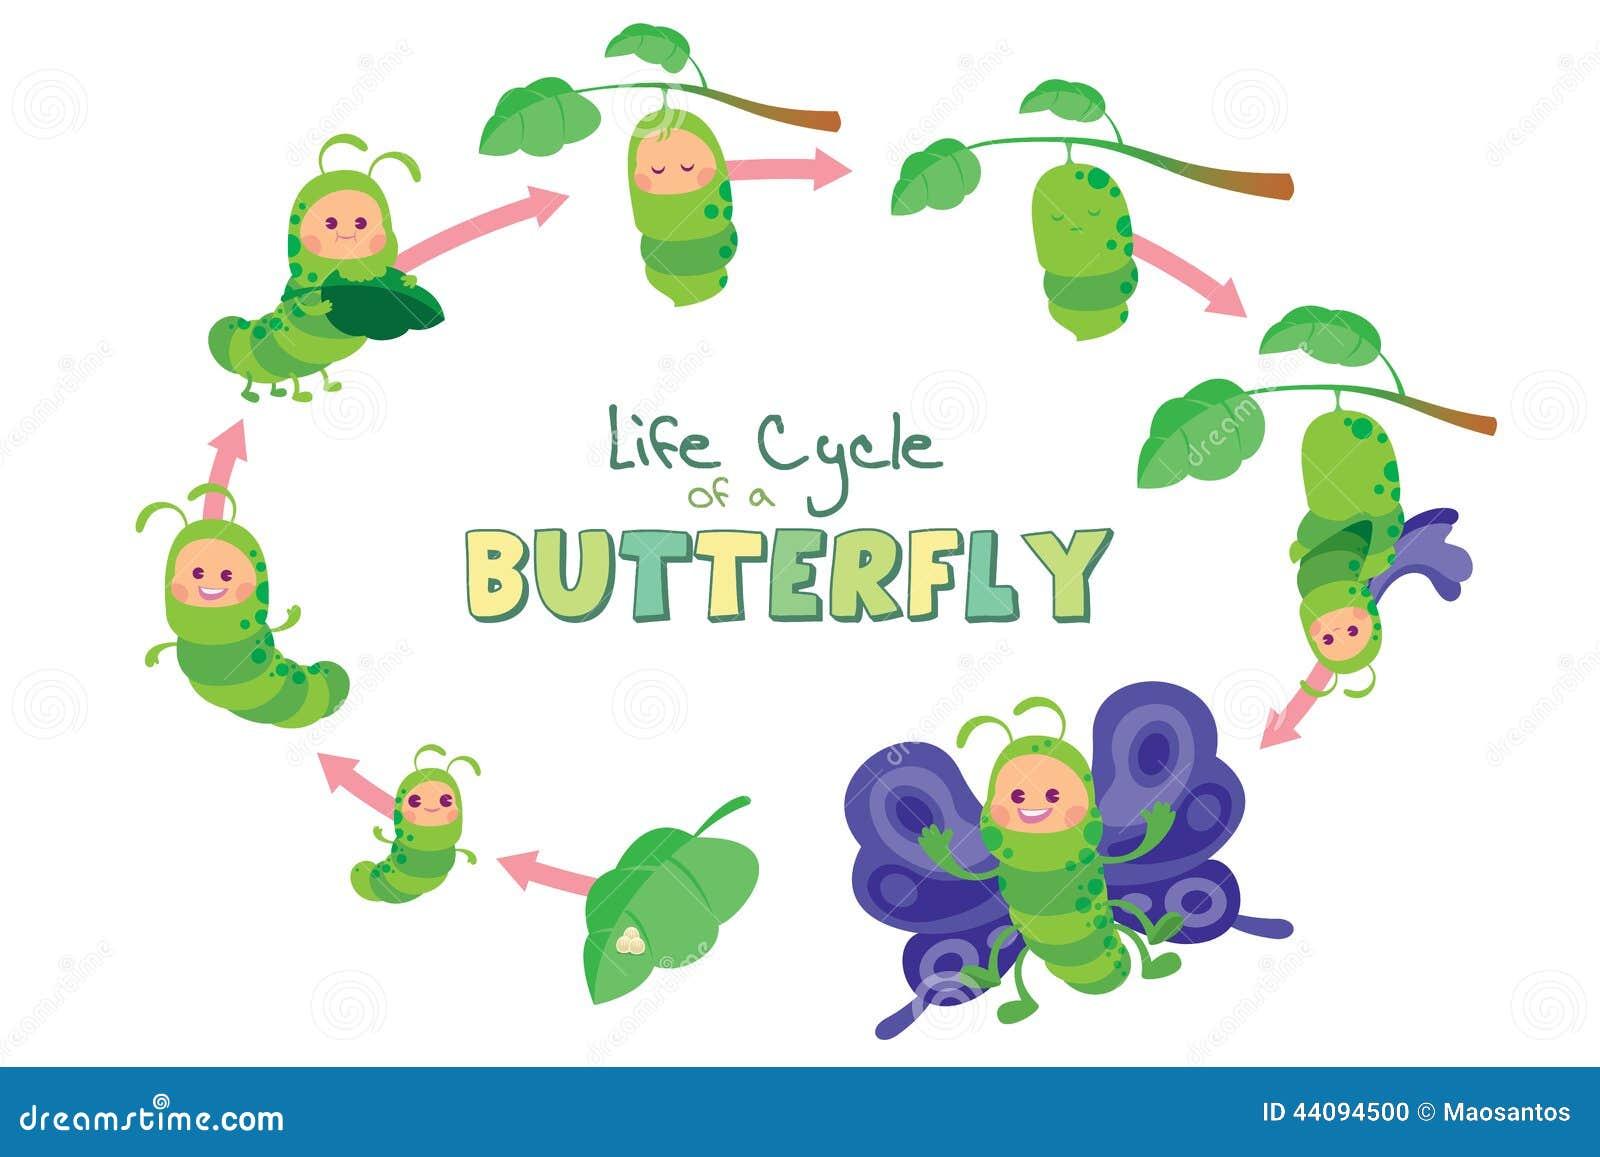 butterfly life cycle metamorphosis stock illustrations u2013 55